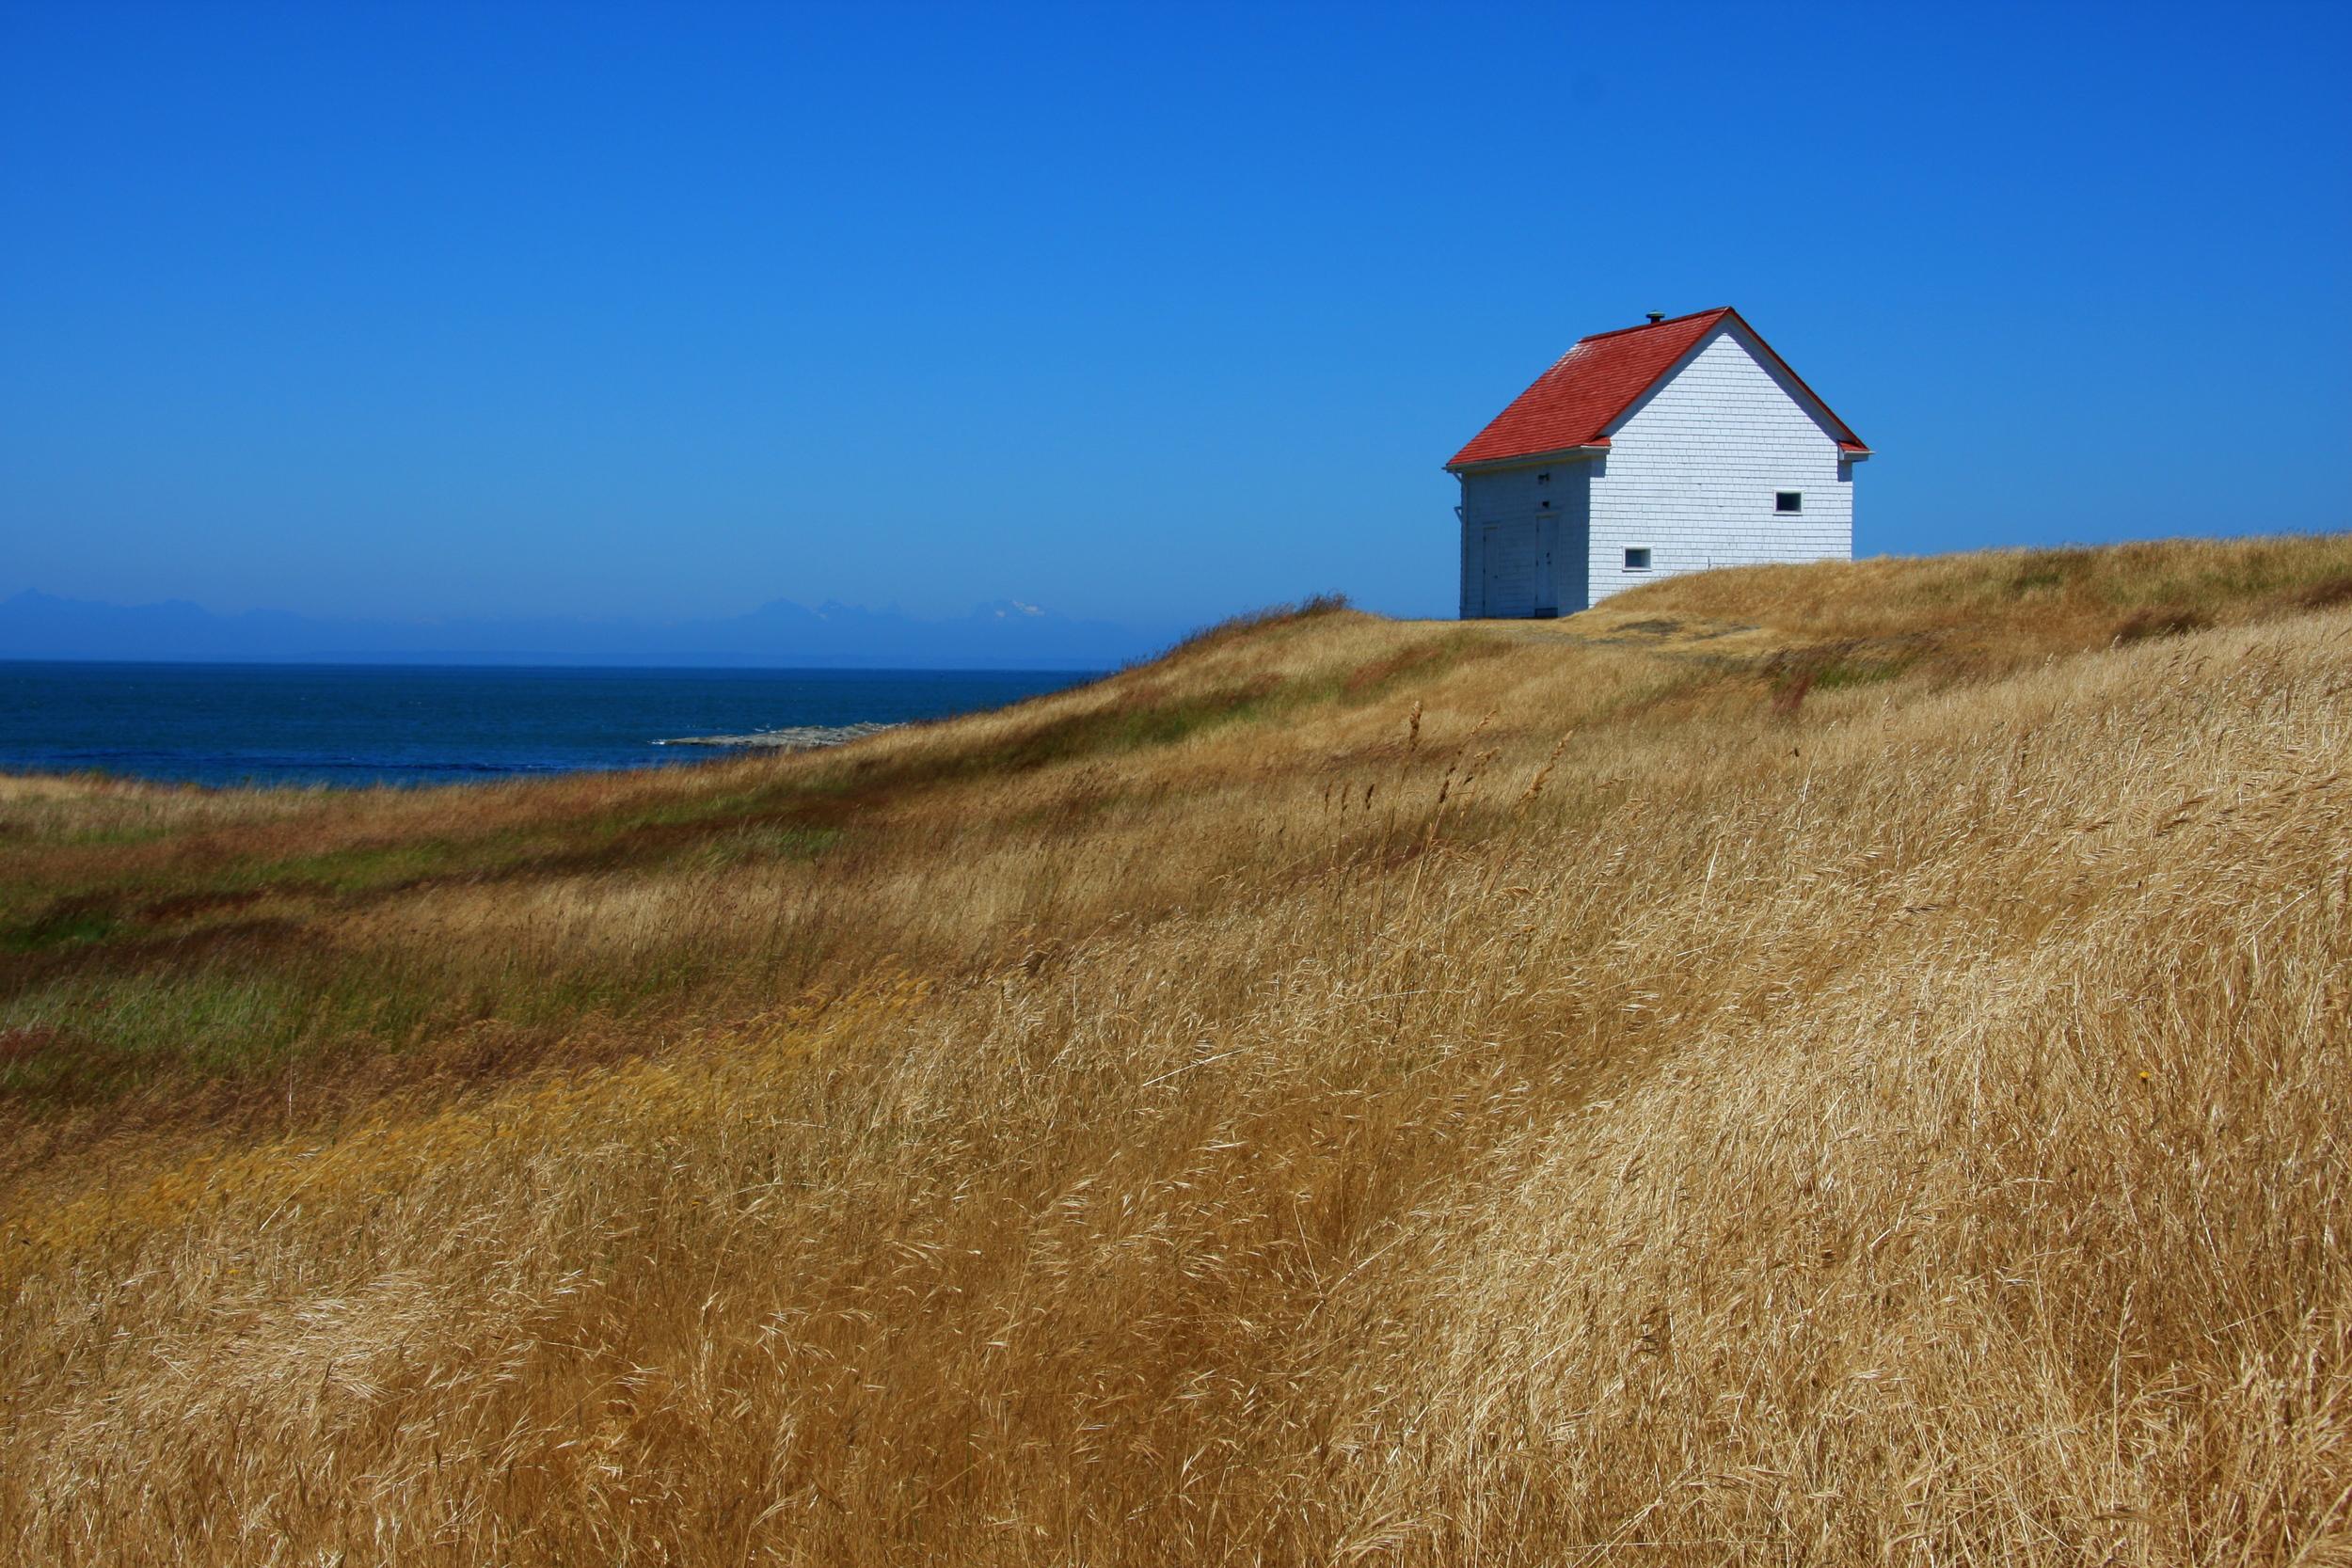 East Point, Saturna Island